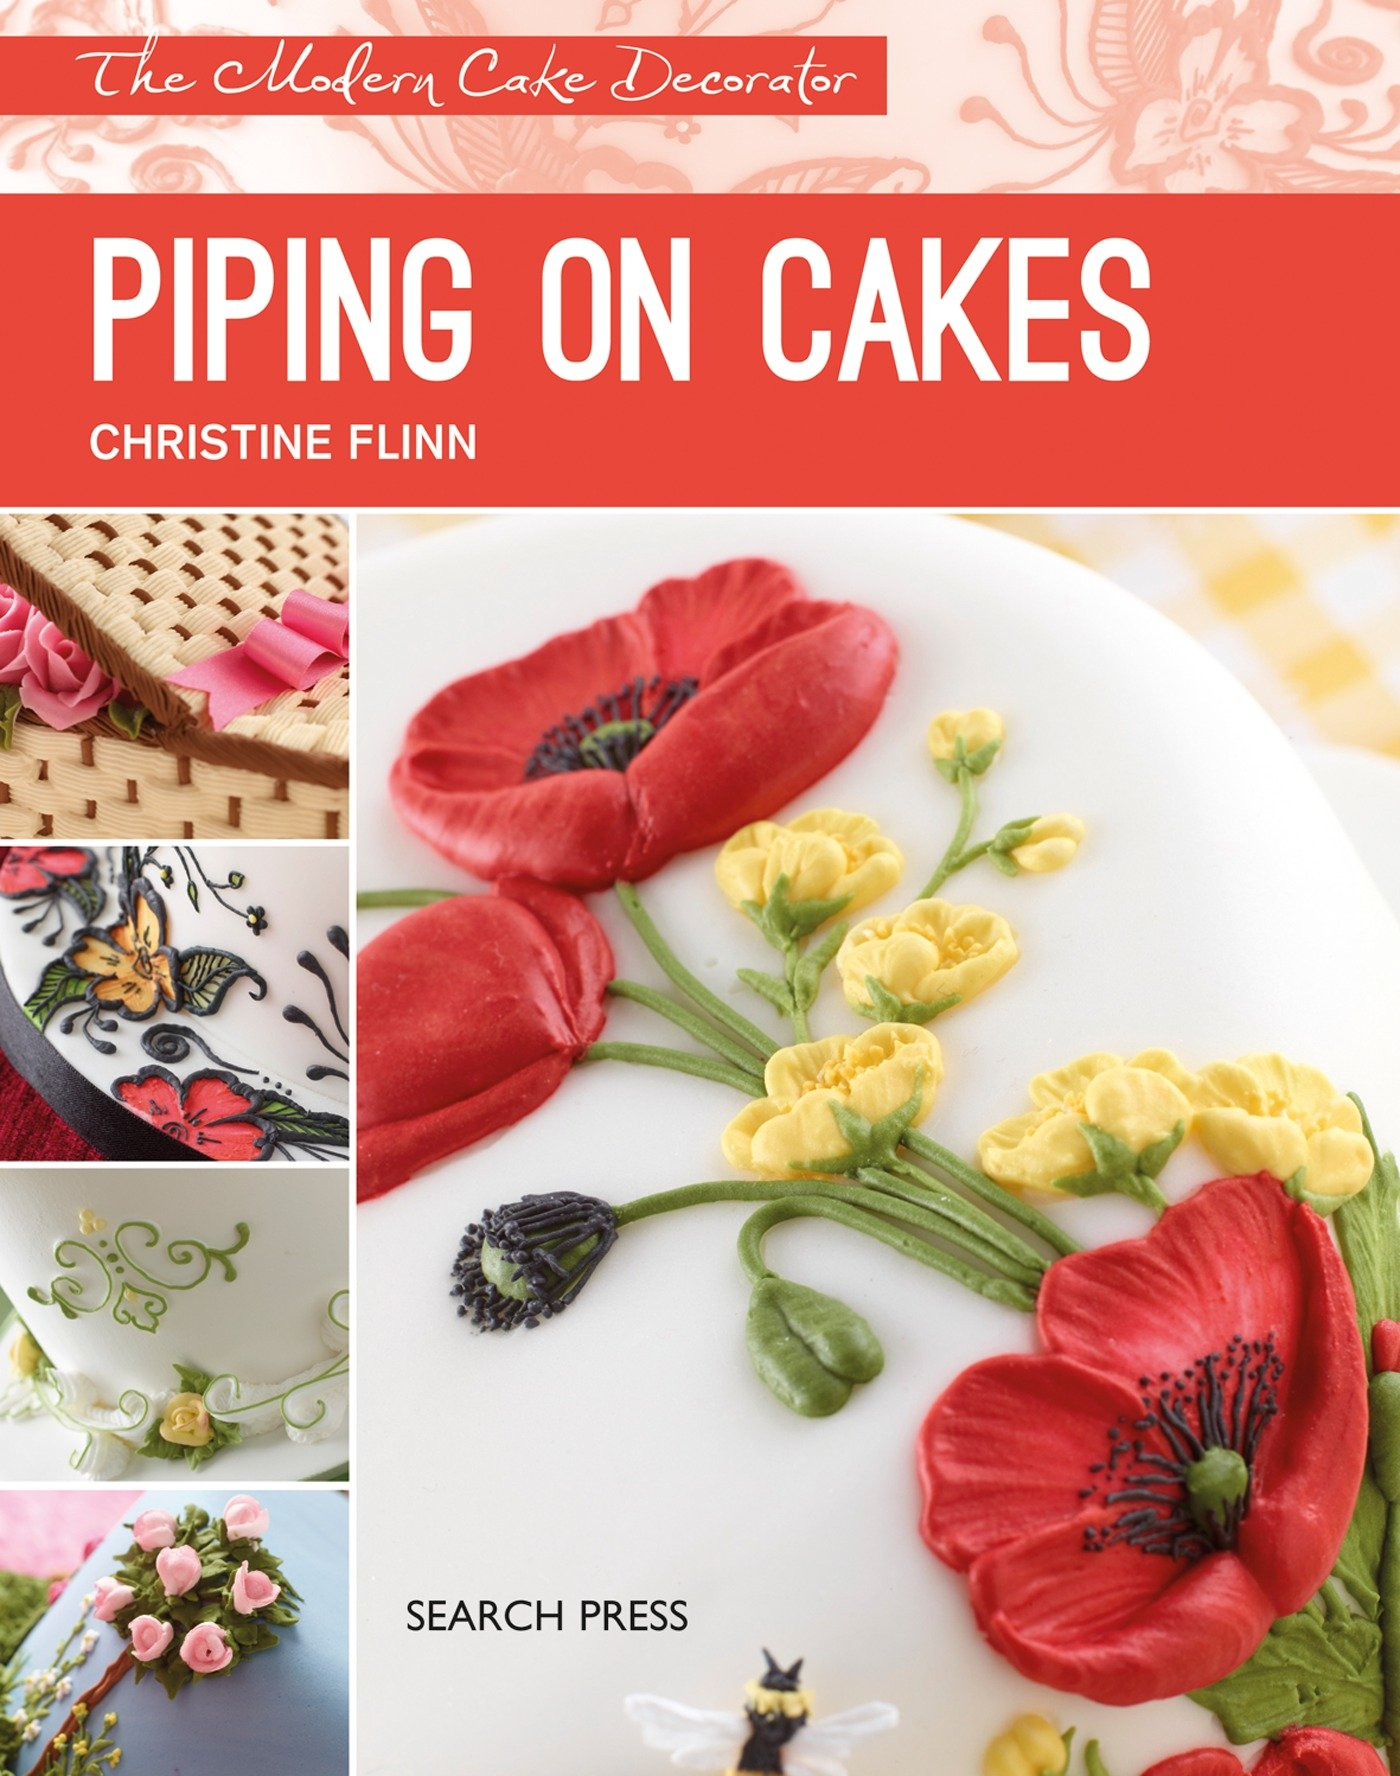 Modern Cake Decorator: Piping on Cakes